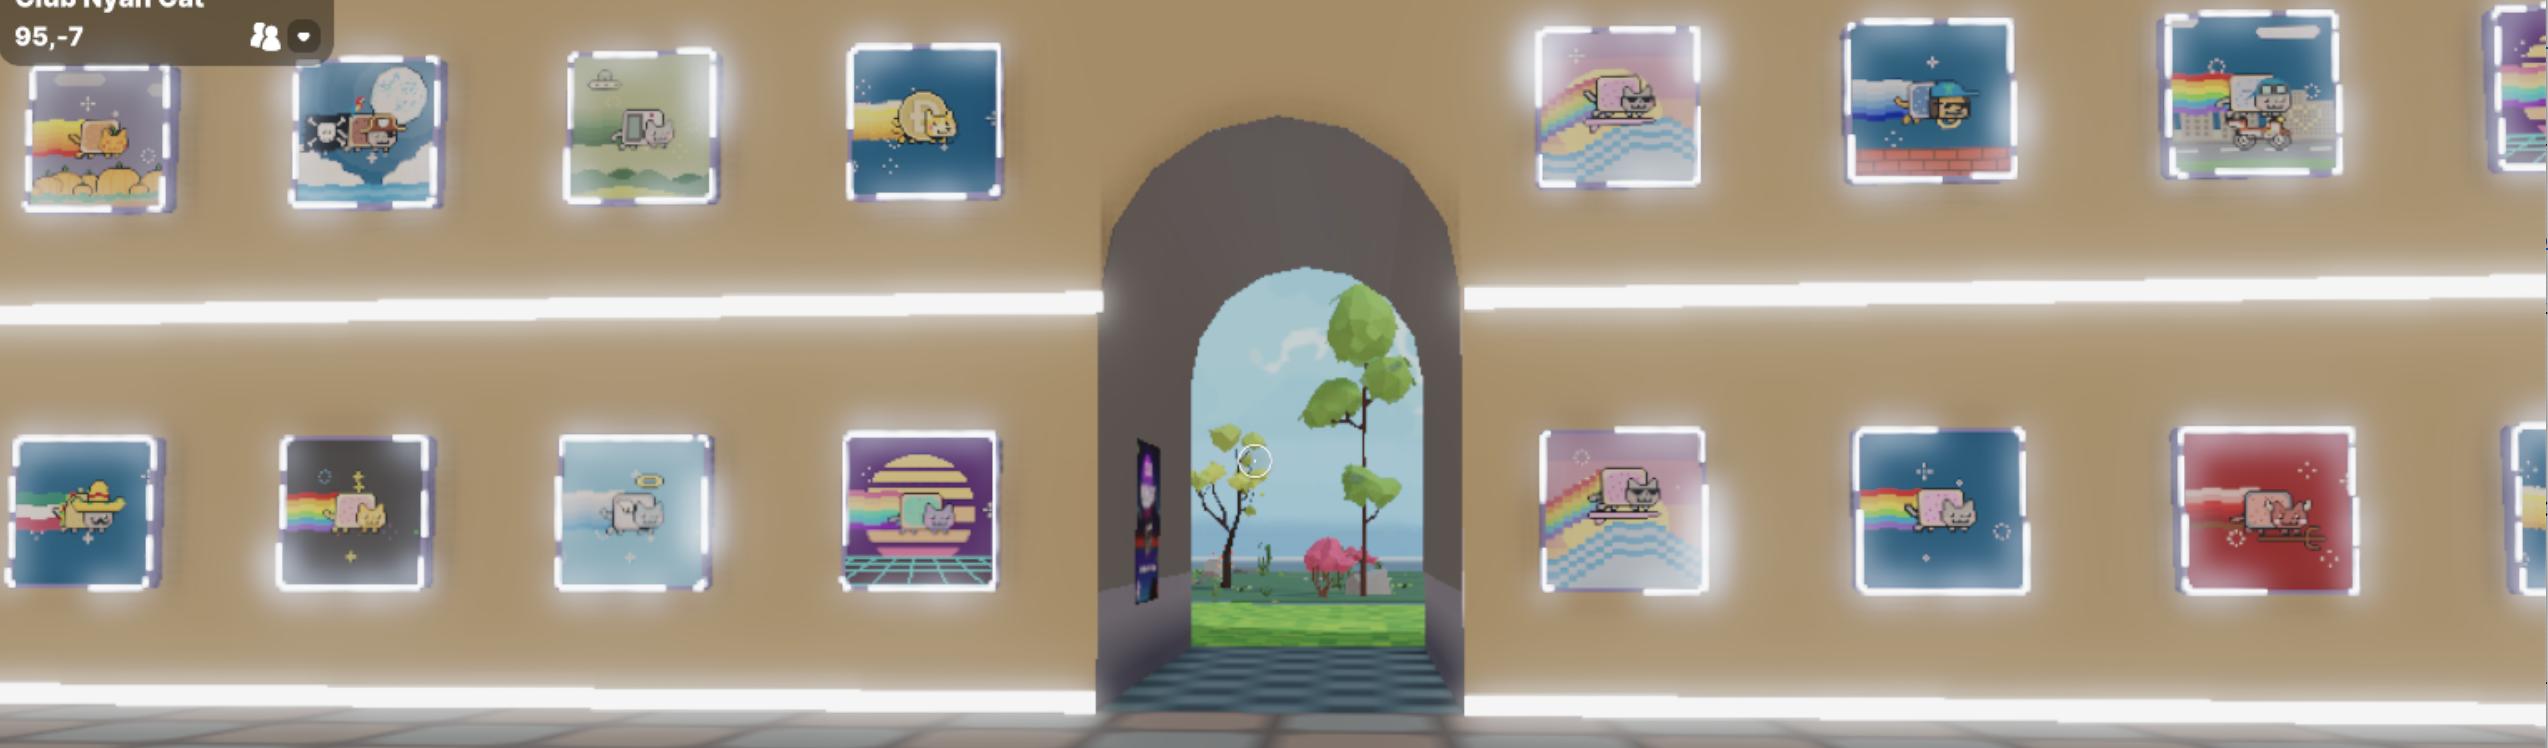 Nyan Cat NFT gallery on Decentraland, Oct 2021